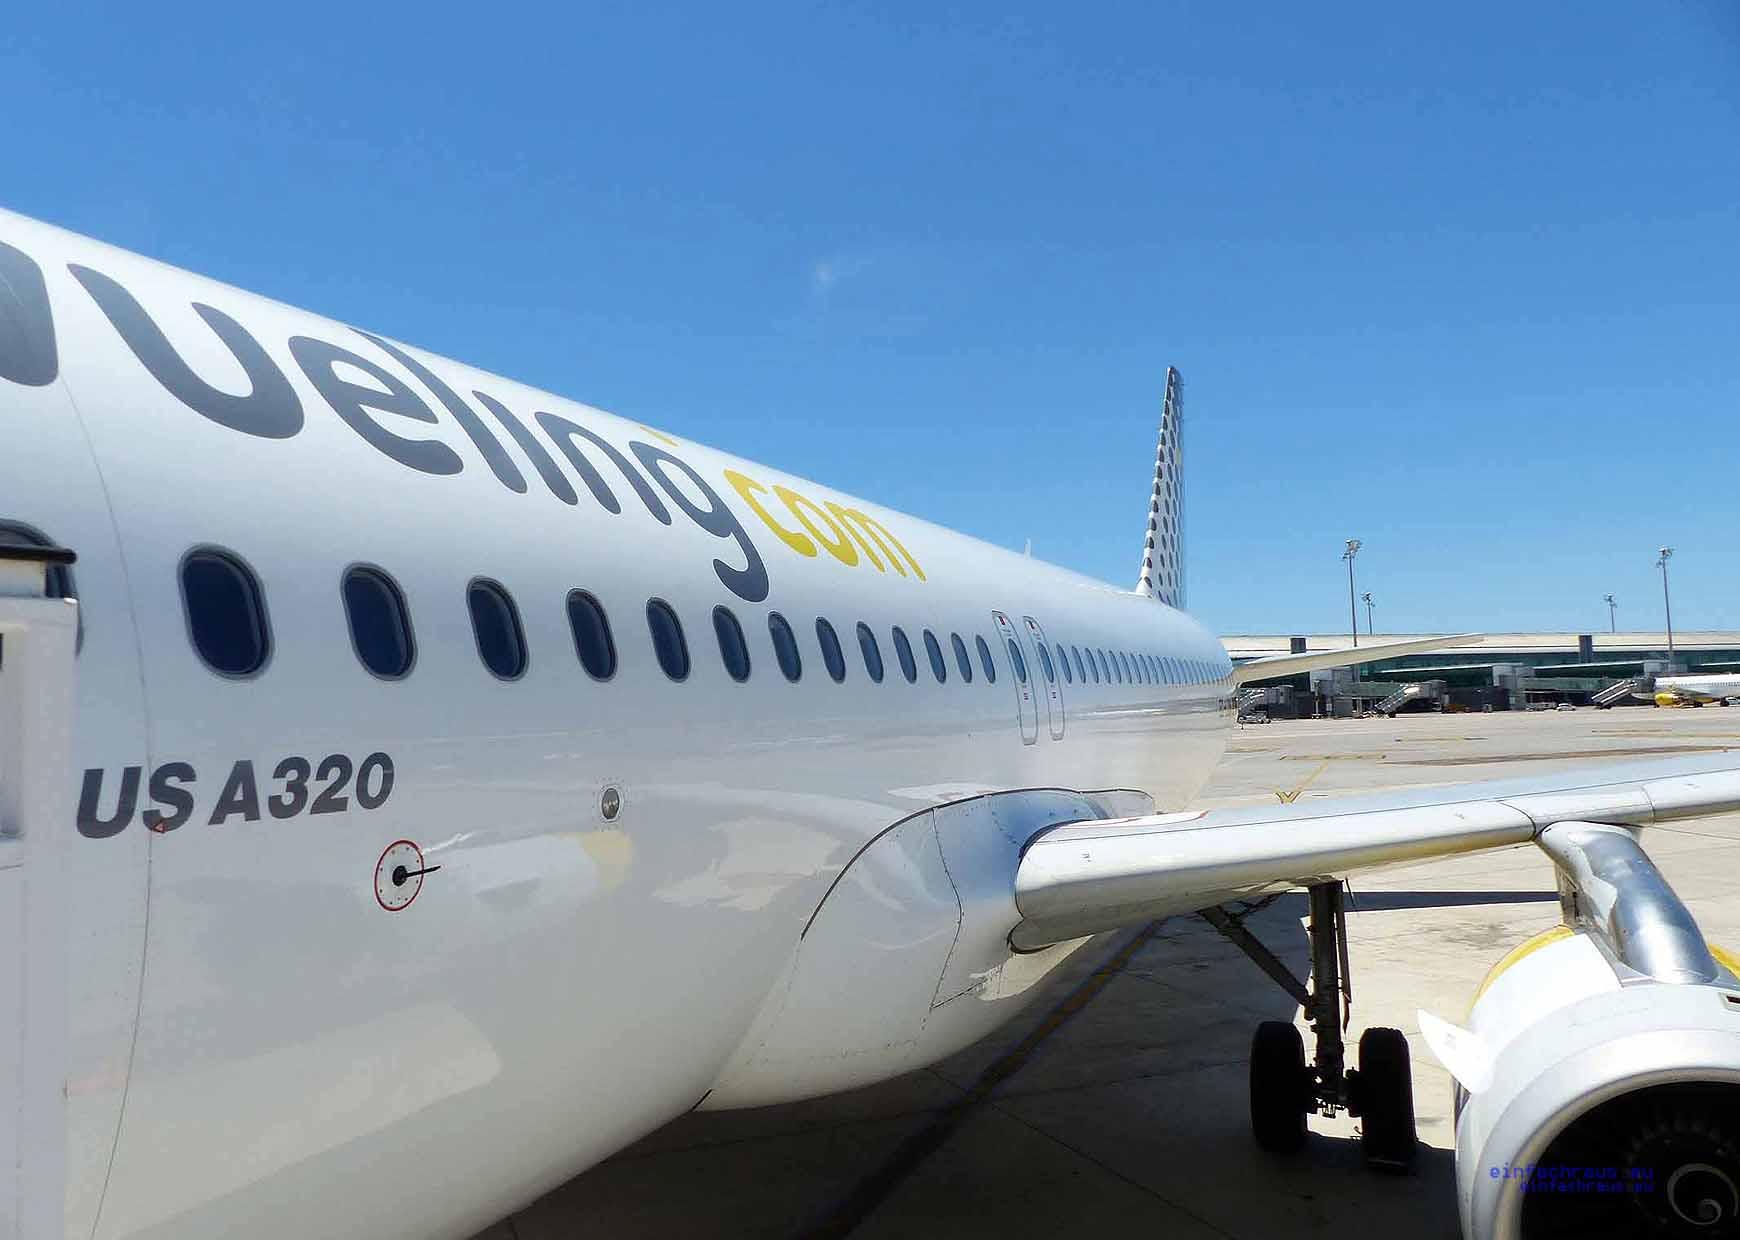 Vueling-Barcelonavueling-barcelonap1080407